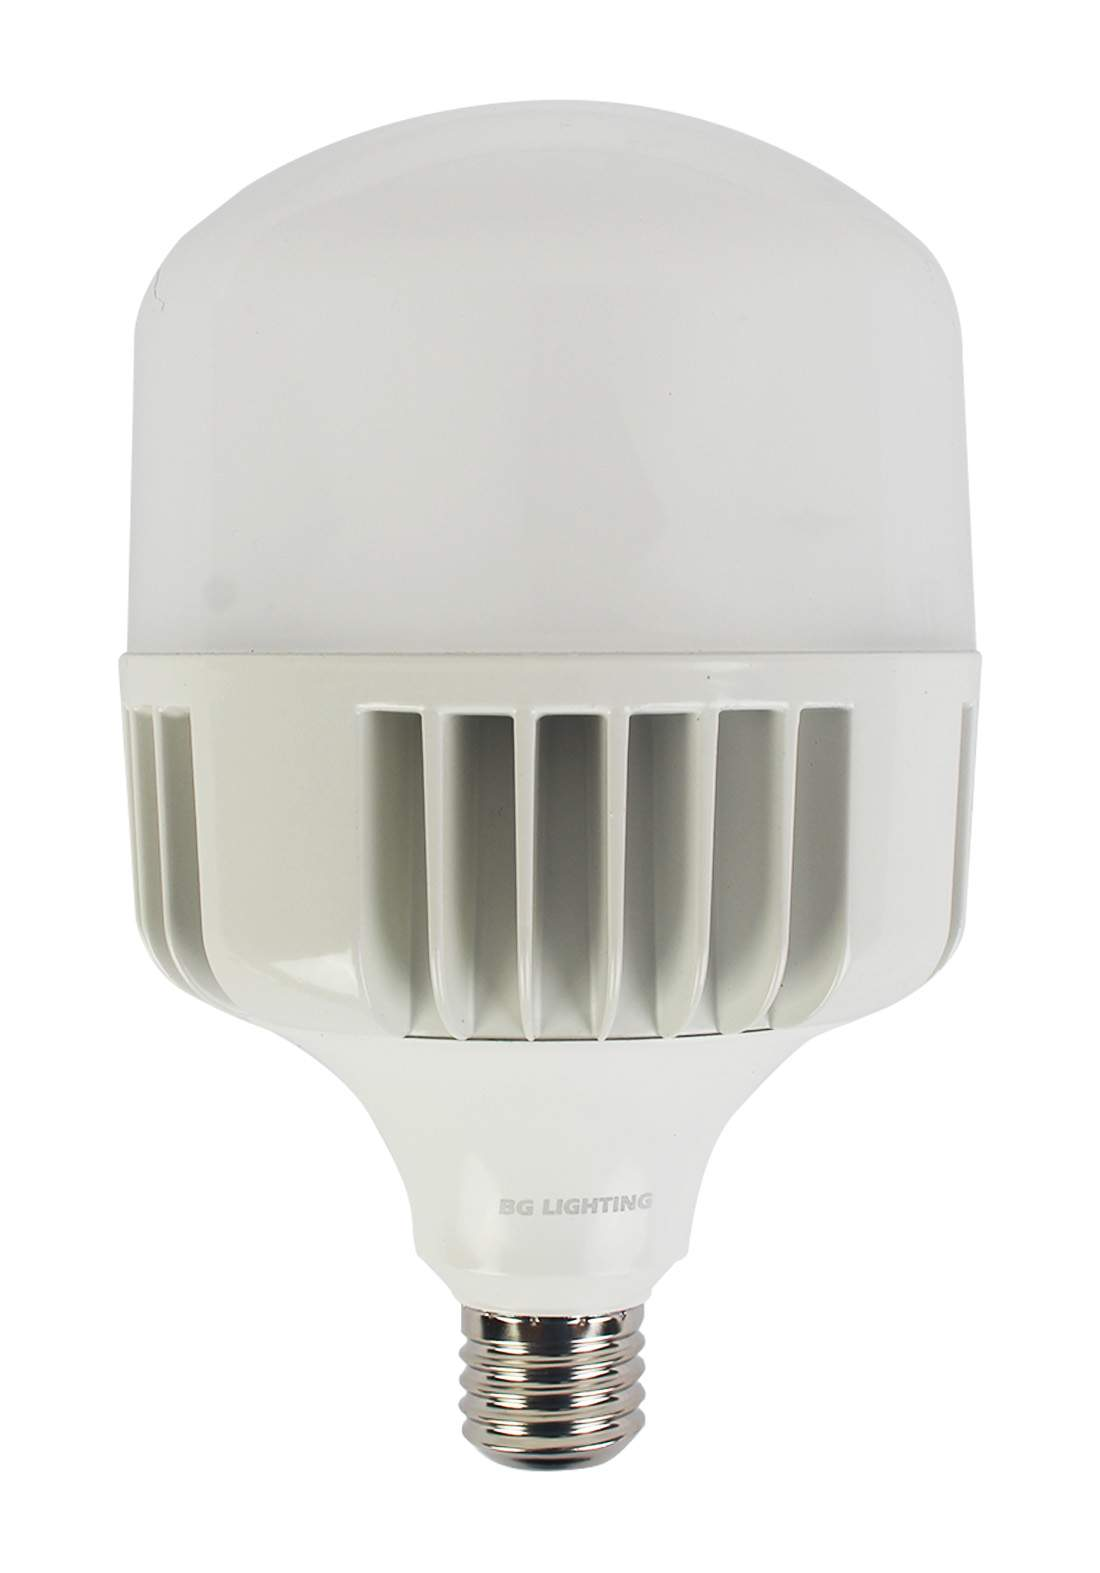 Bg BT27C50W45 led 50W مصباح ليد